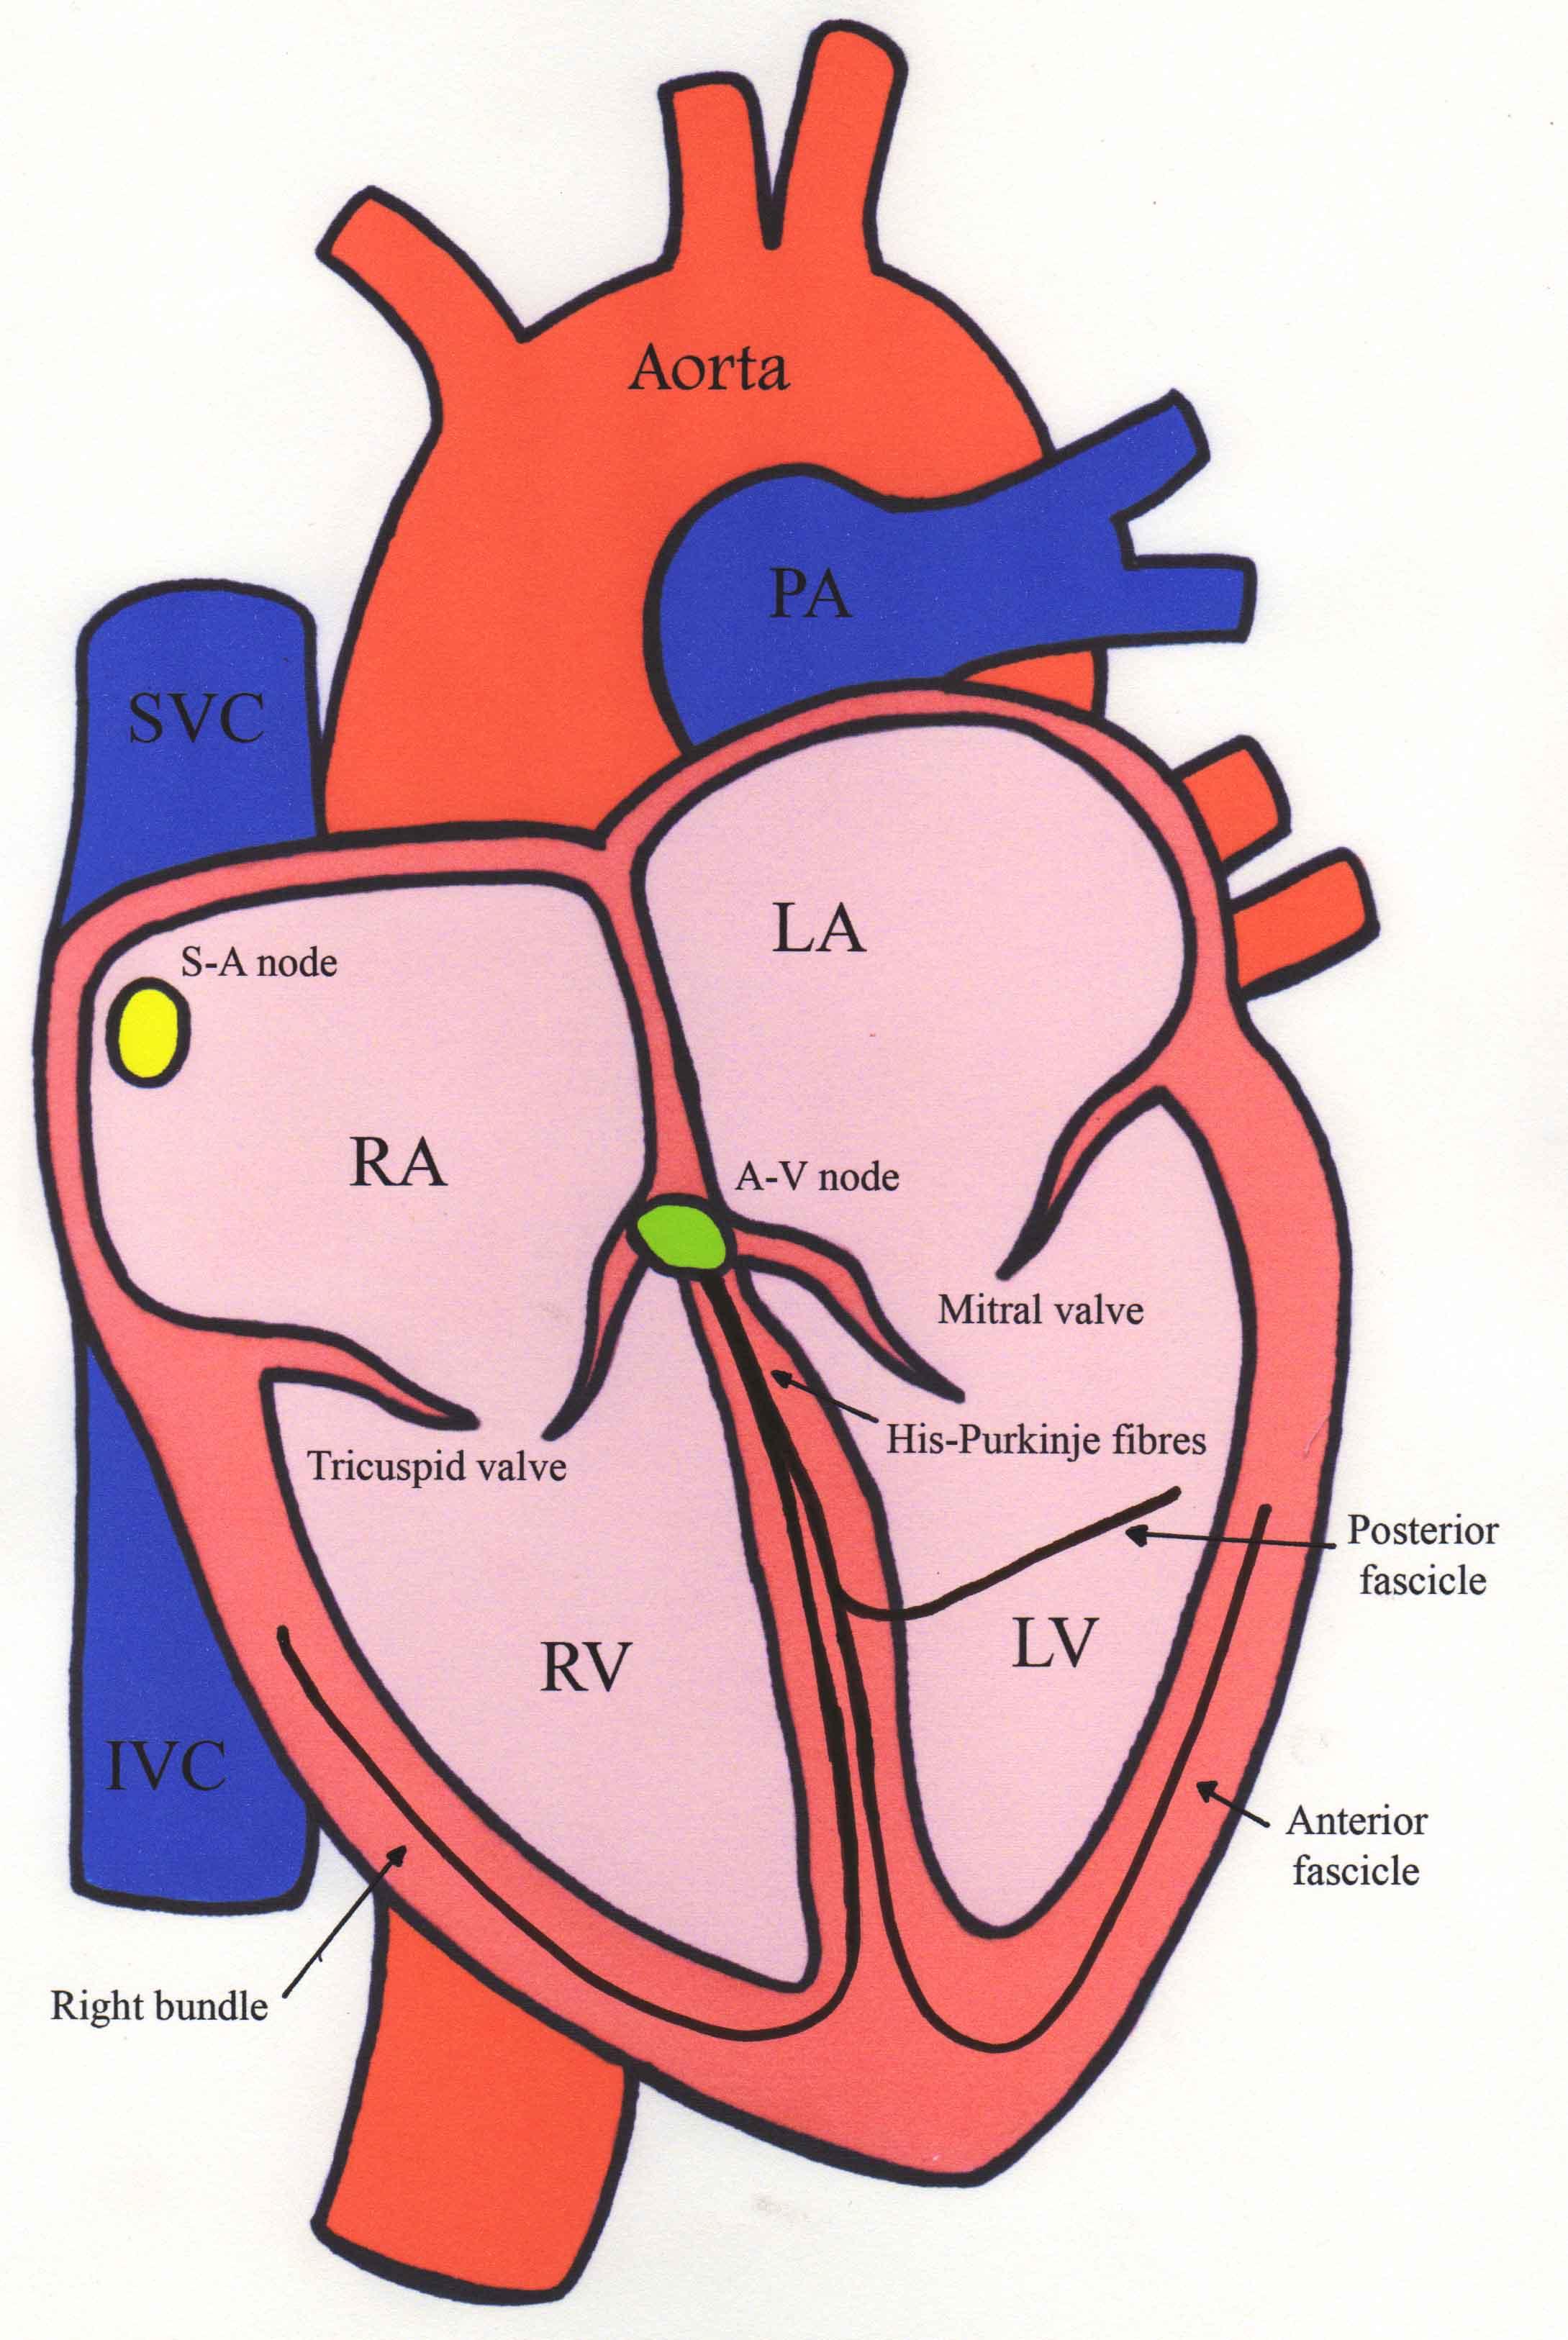 heart diagram nodes hyundai santa fe ecu wiring supraventricular tachycardia